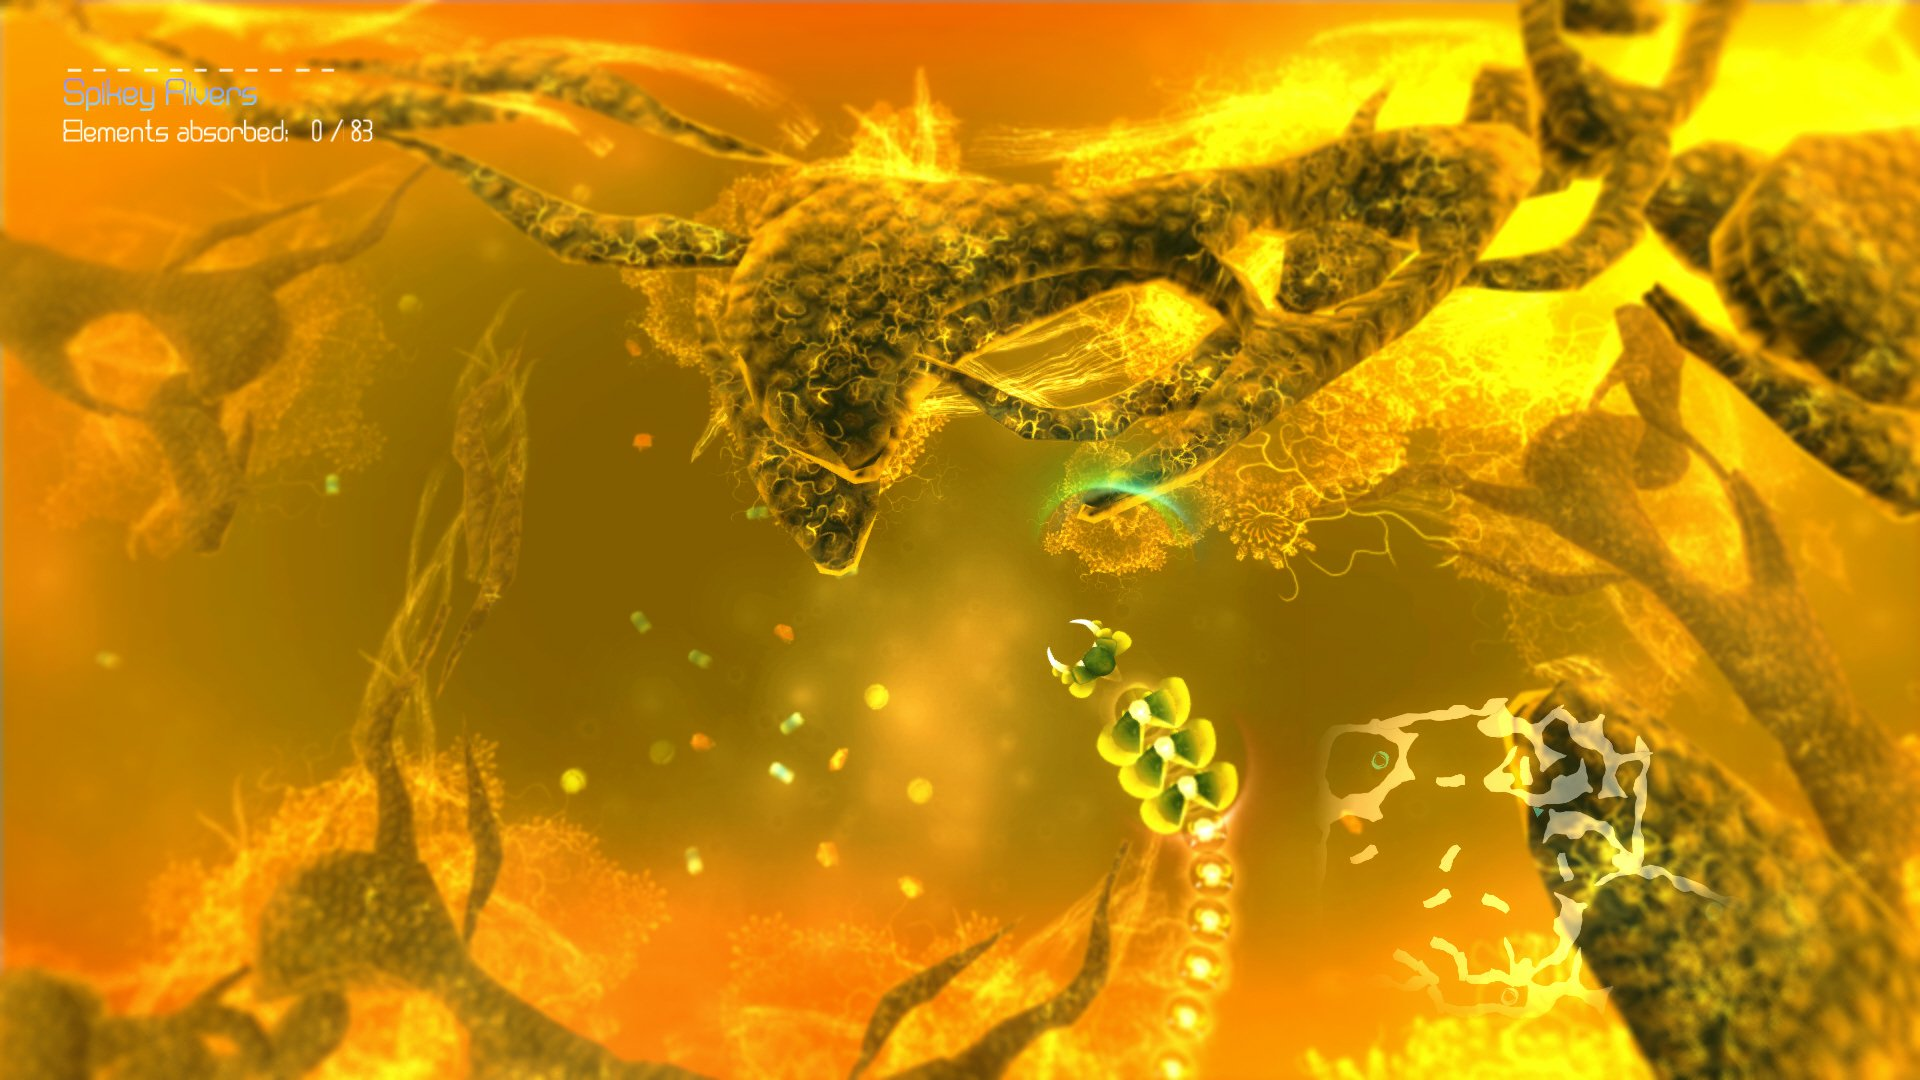 Sparkle 3 Genesis 8